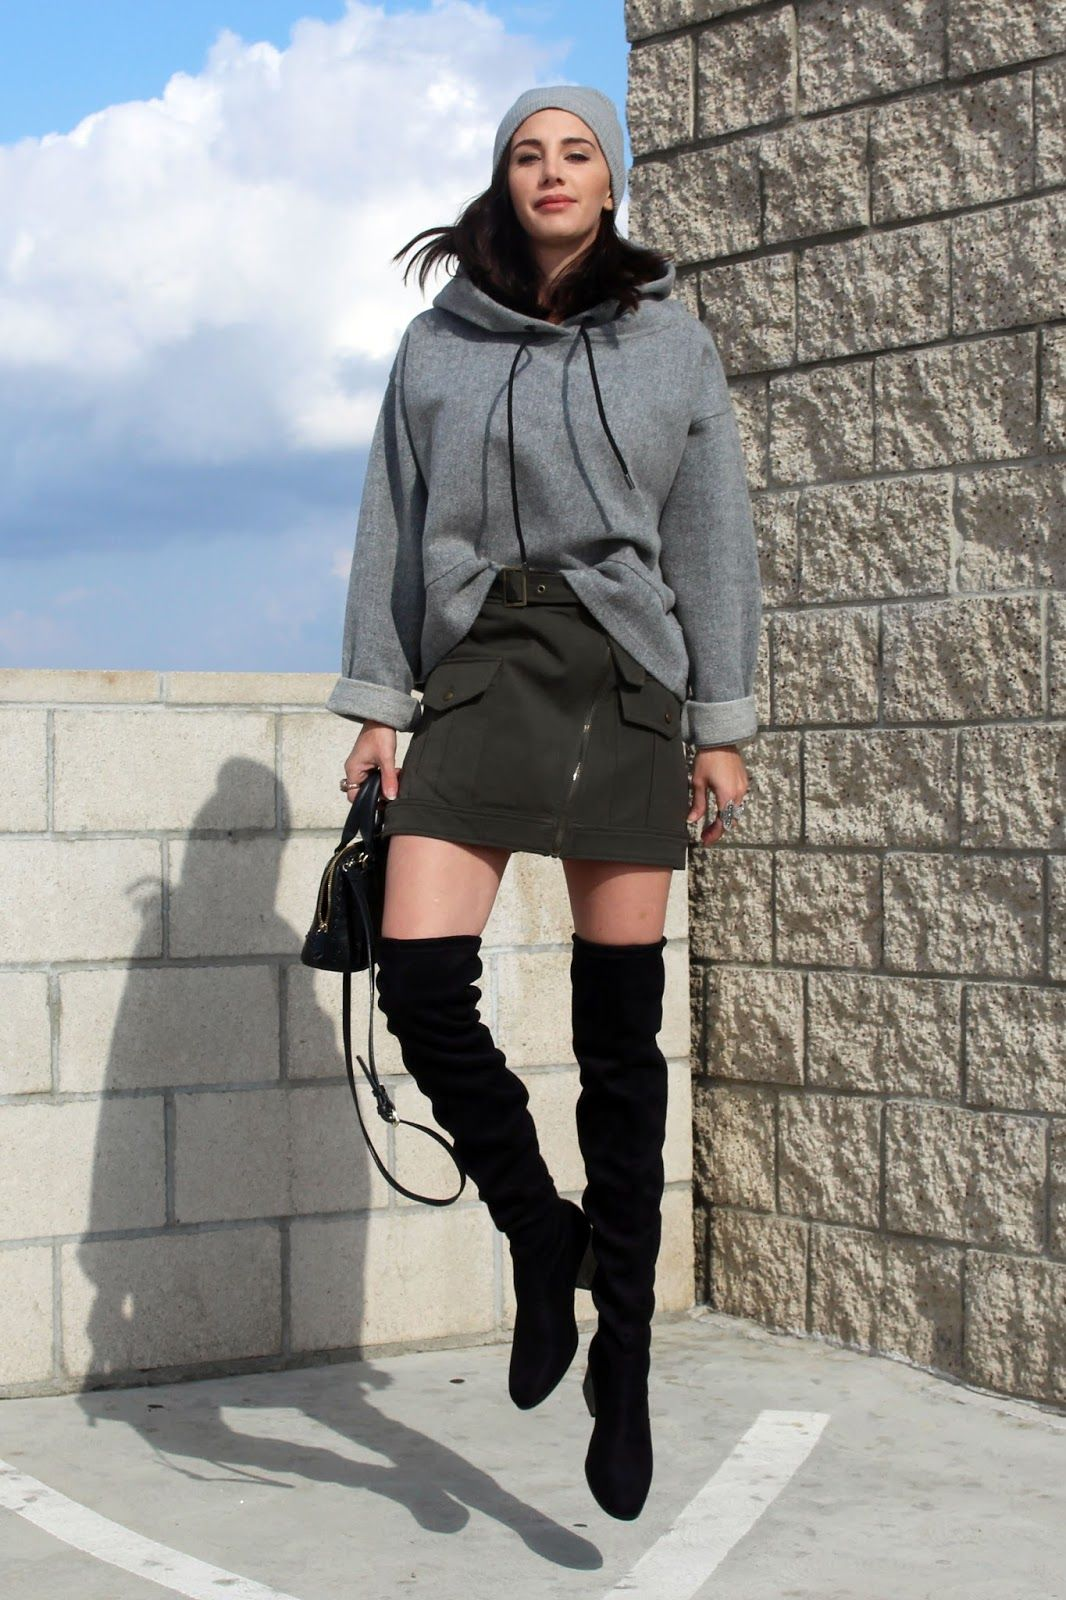 Over Knee Boots Hoodie Army Green Mini Skirt Street